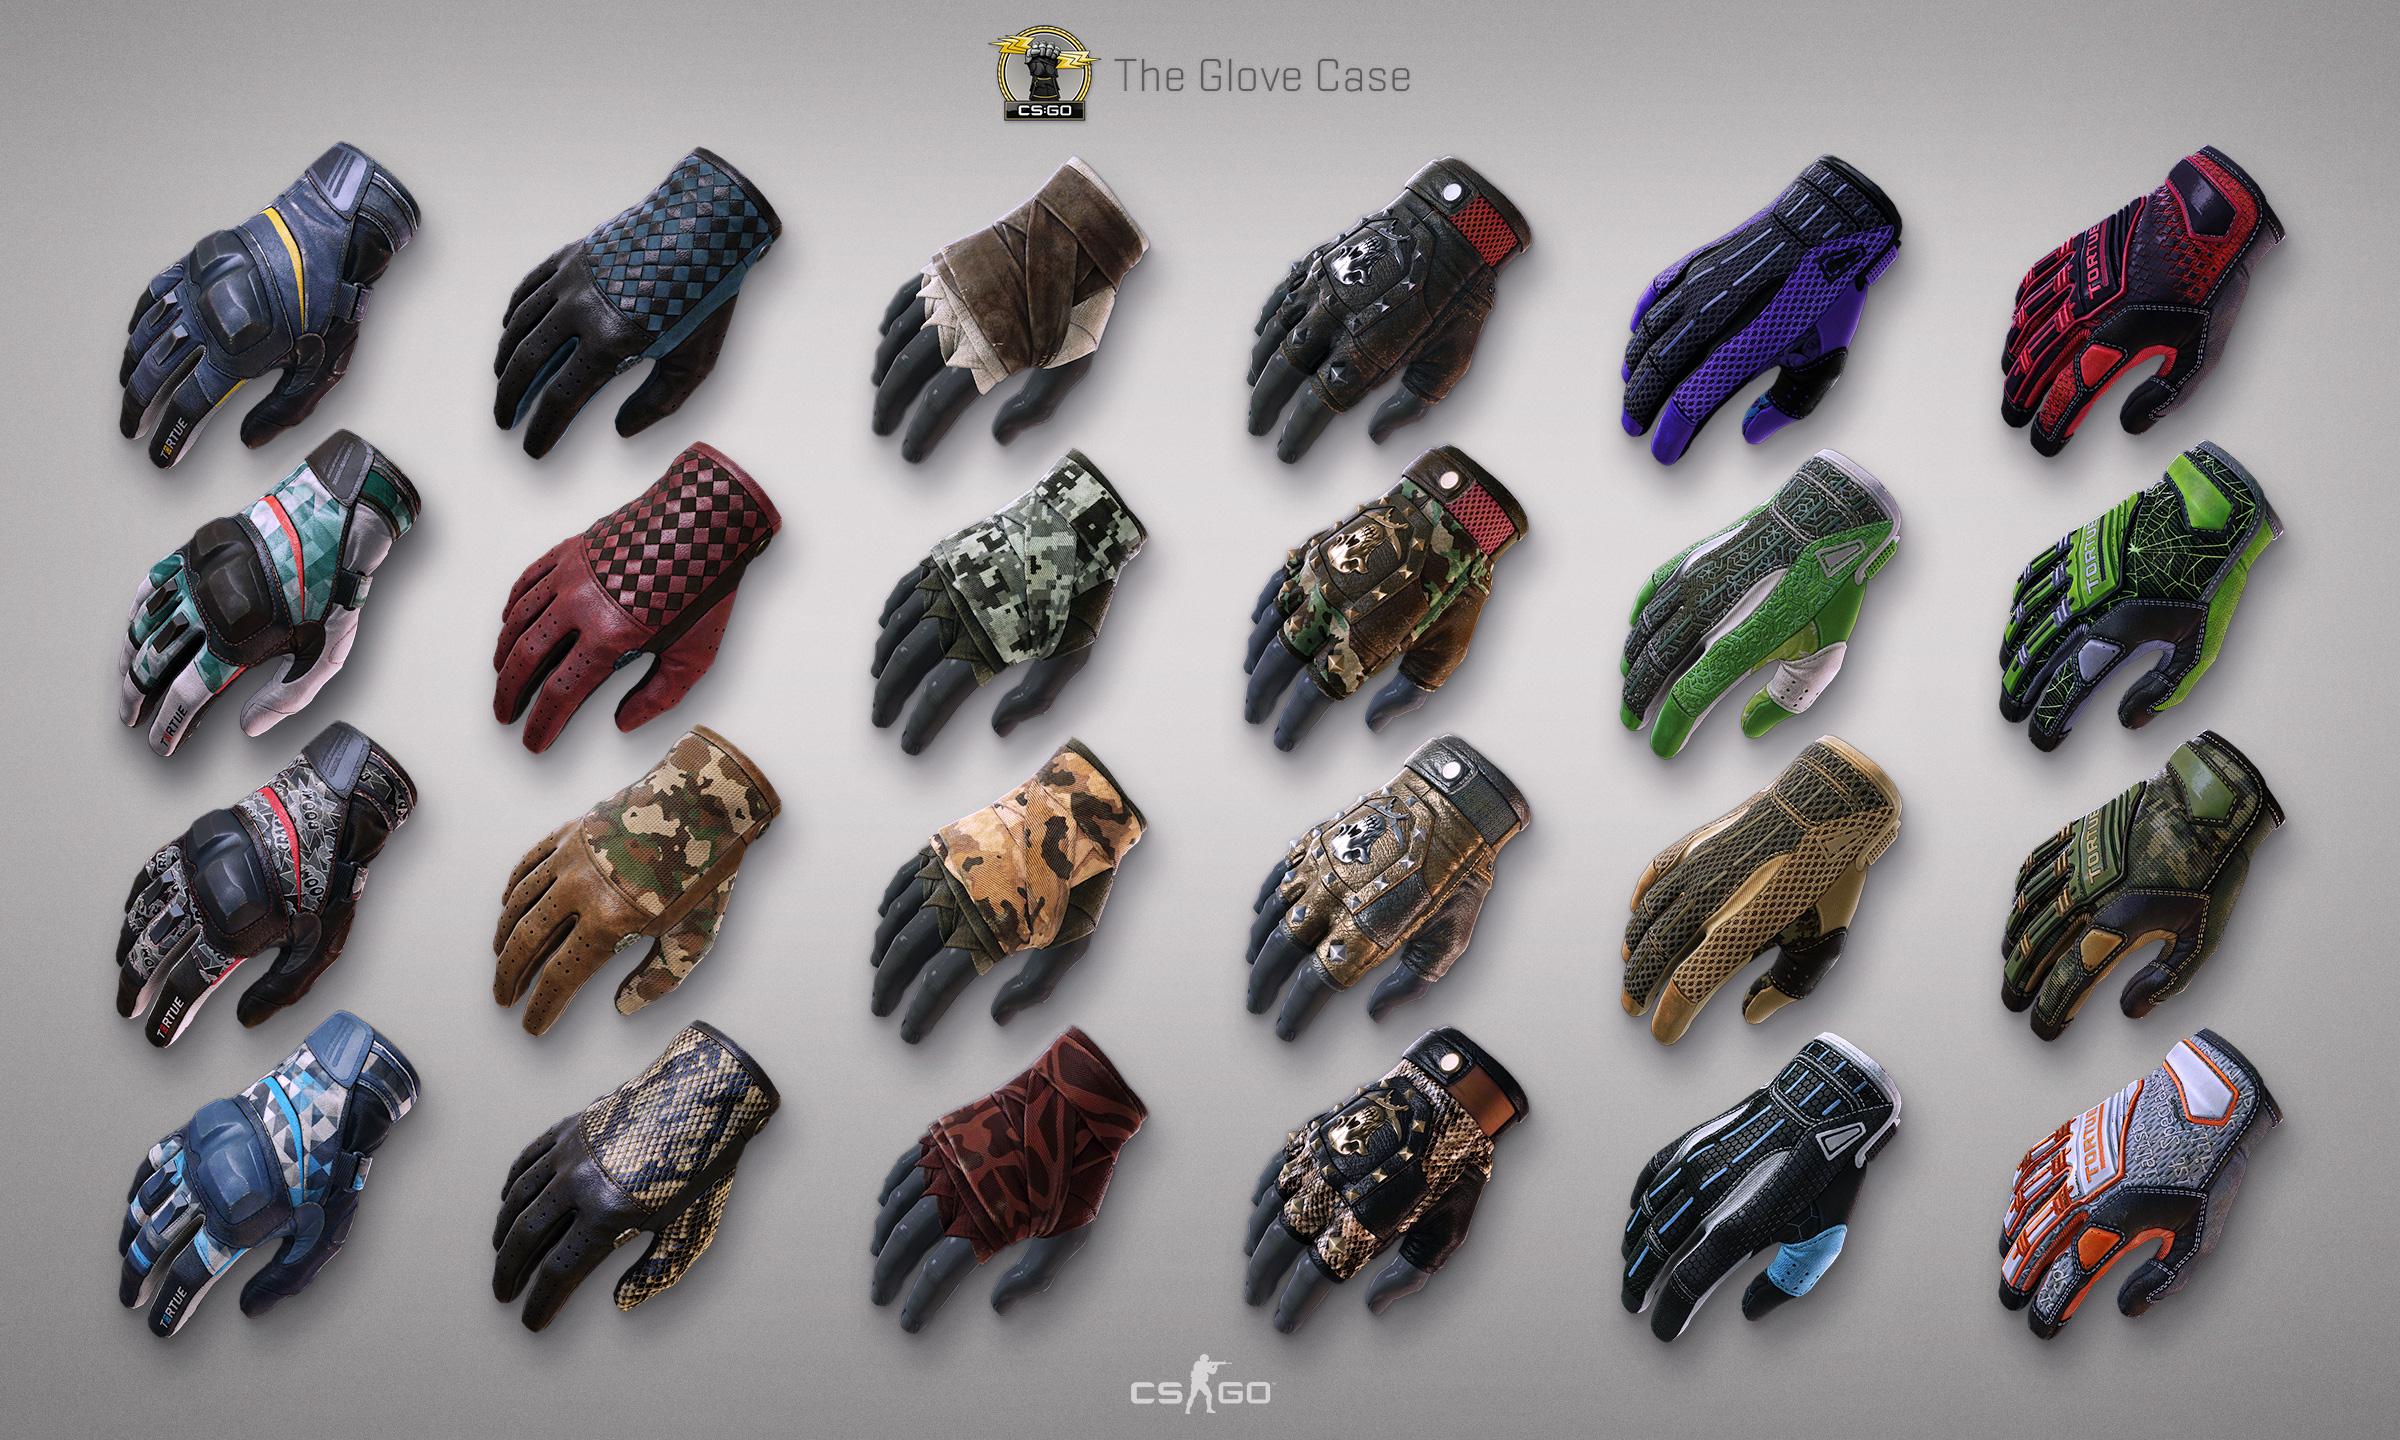 http://media.steampowered.com/apps/csgo/blog/images/glove_collection/new_gloves_2016.jpg?v=4